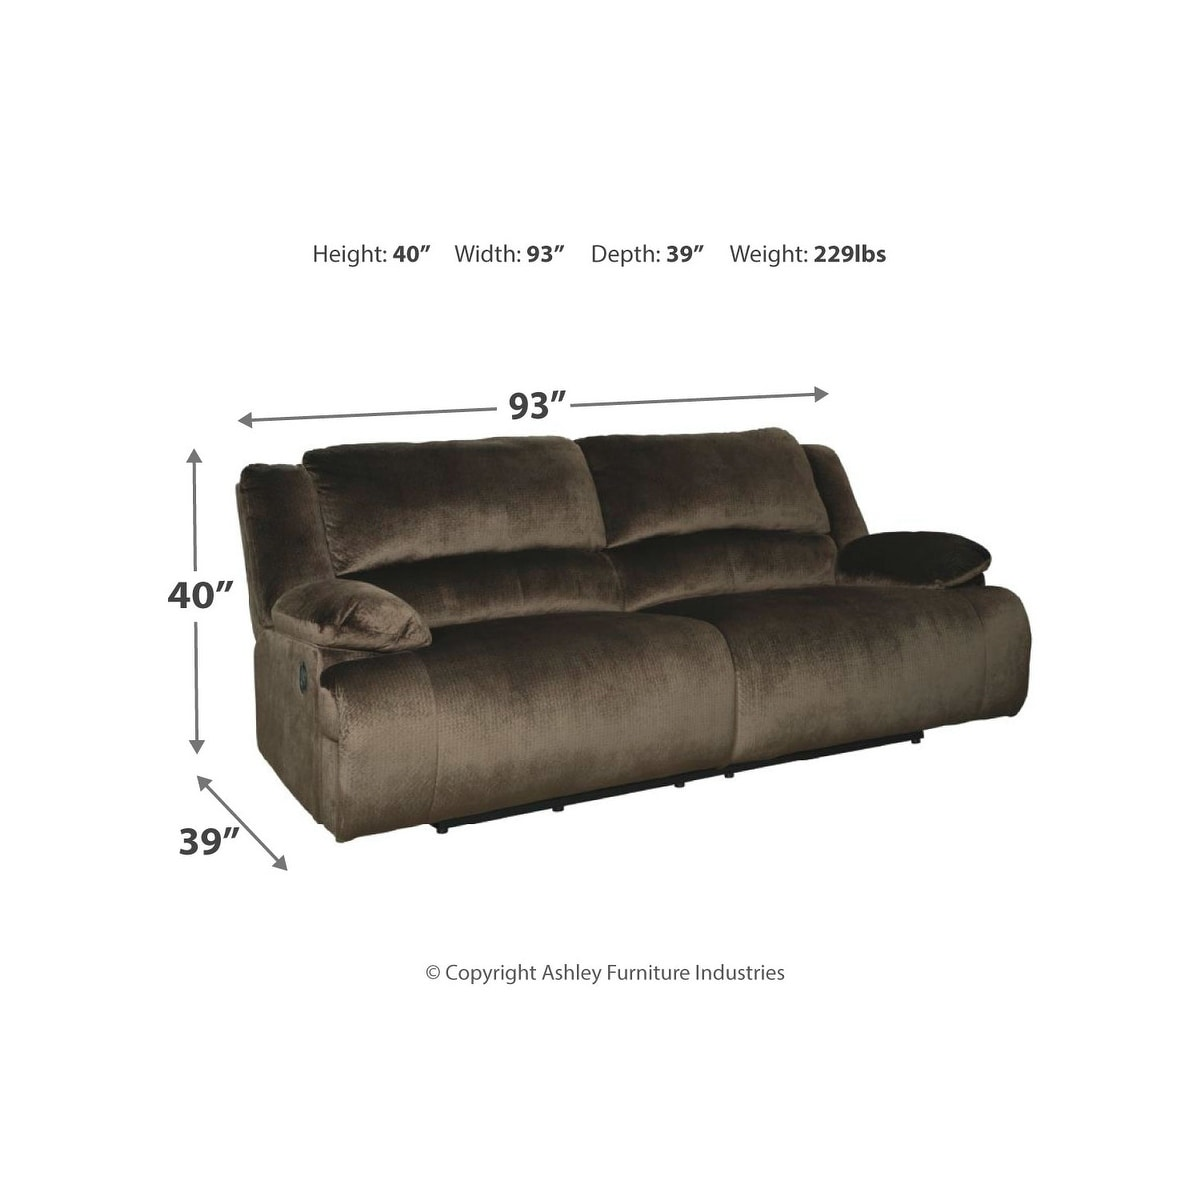 Signature Design by Ashley Clonmel Chocolate 2 Seat Reclining Sofa